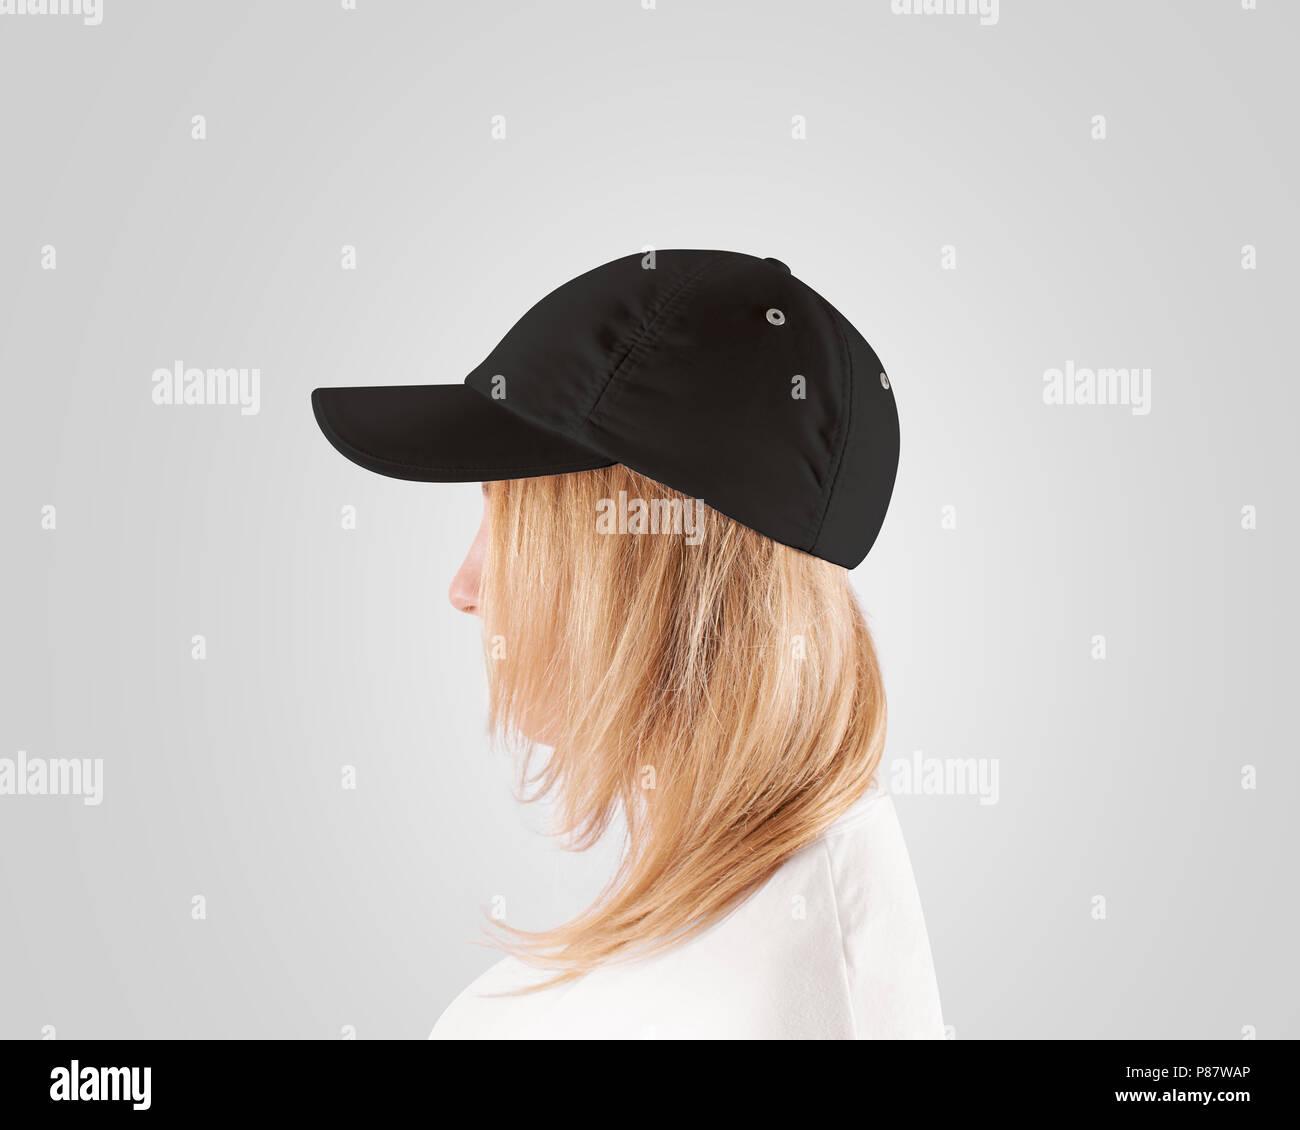 d0d2c0921bba3 Blank black baseball cap mockup template